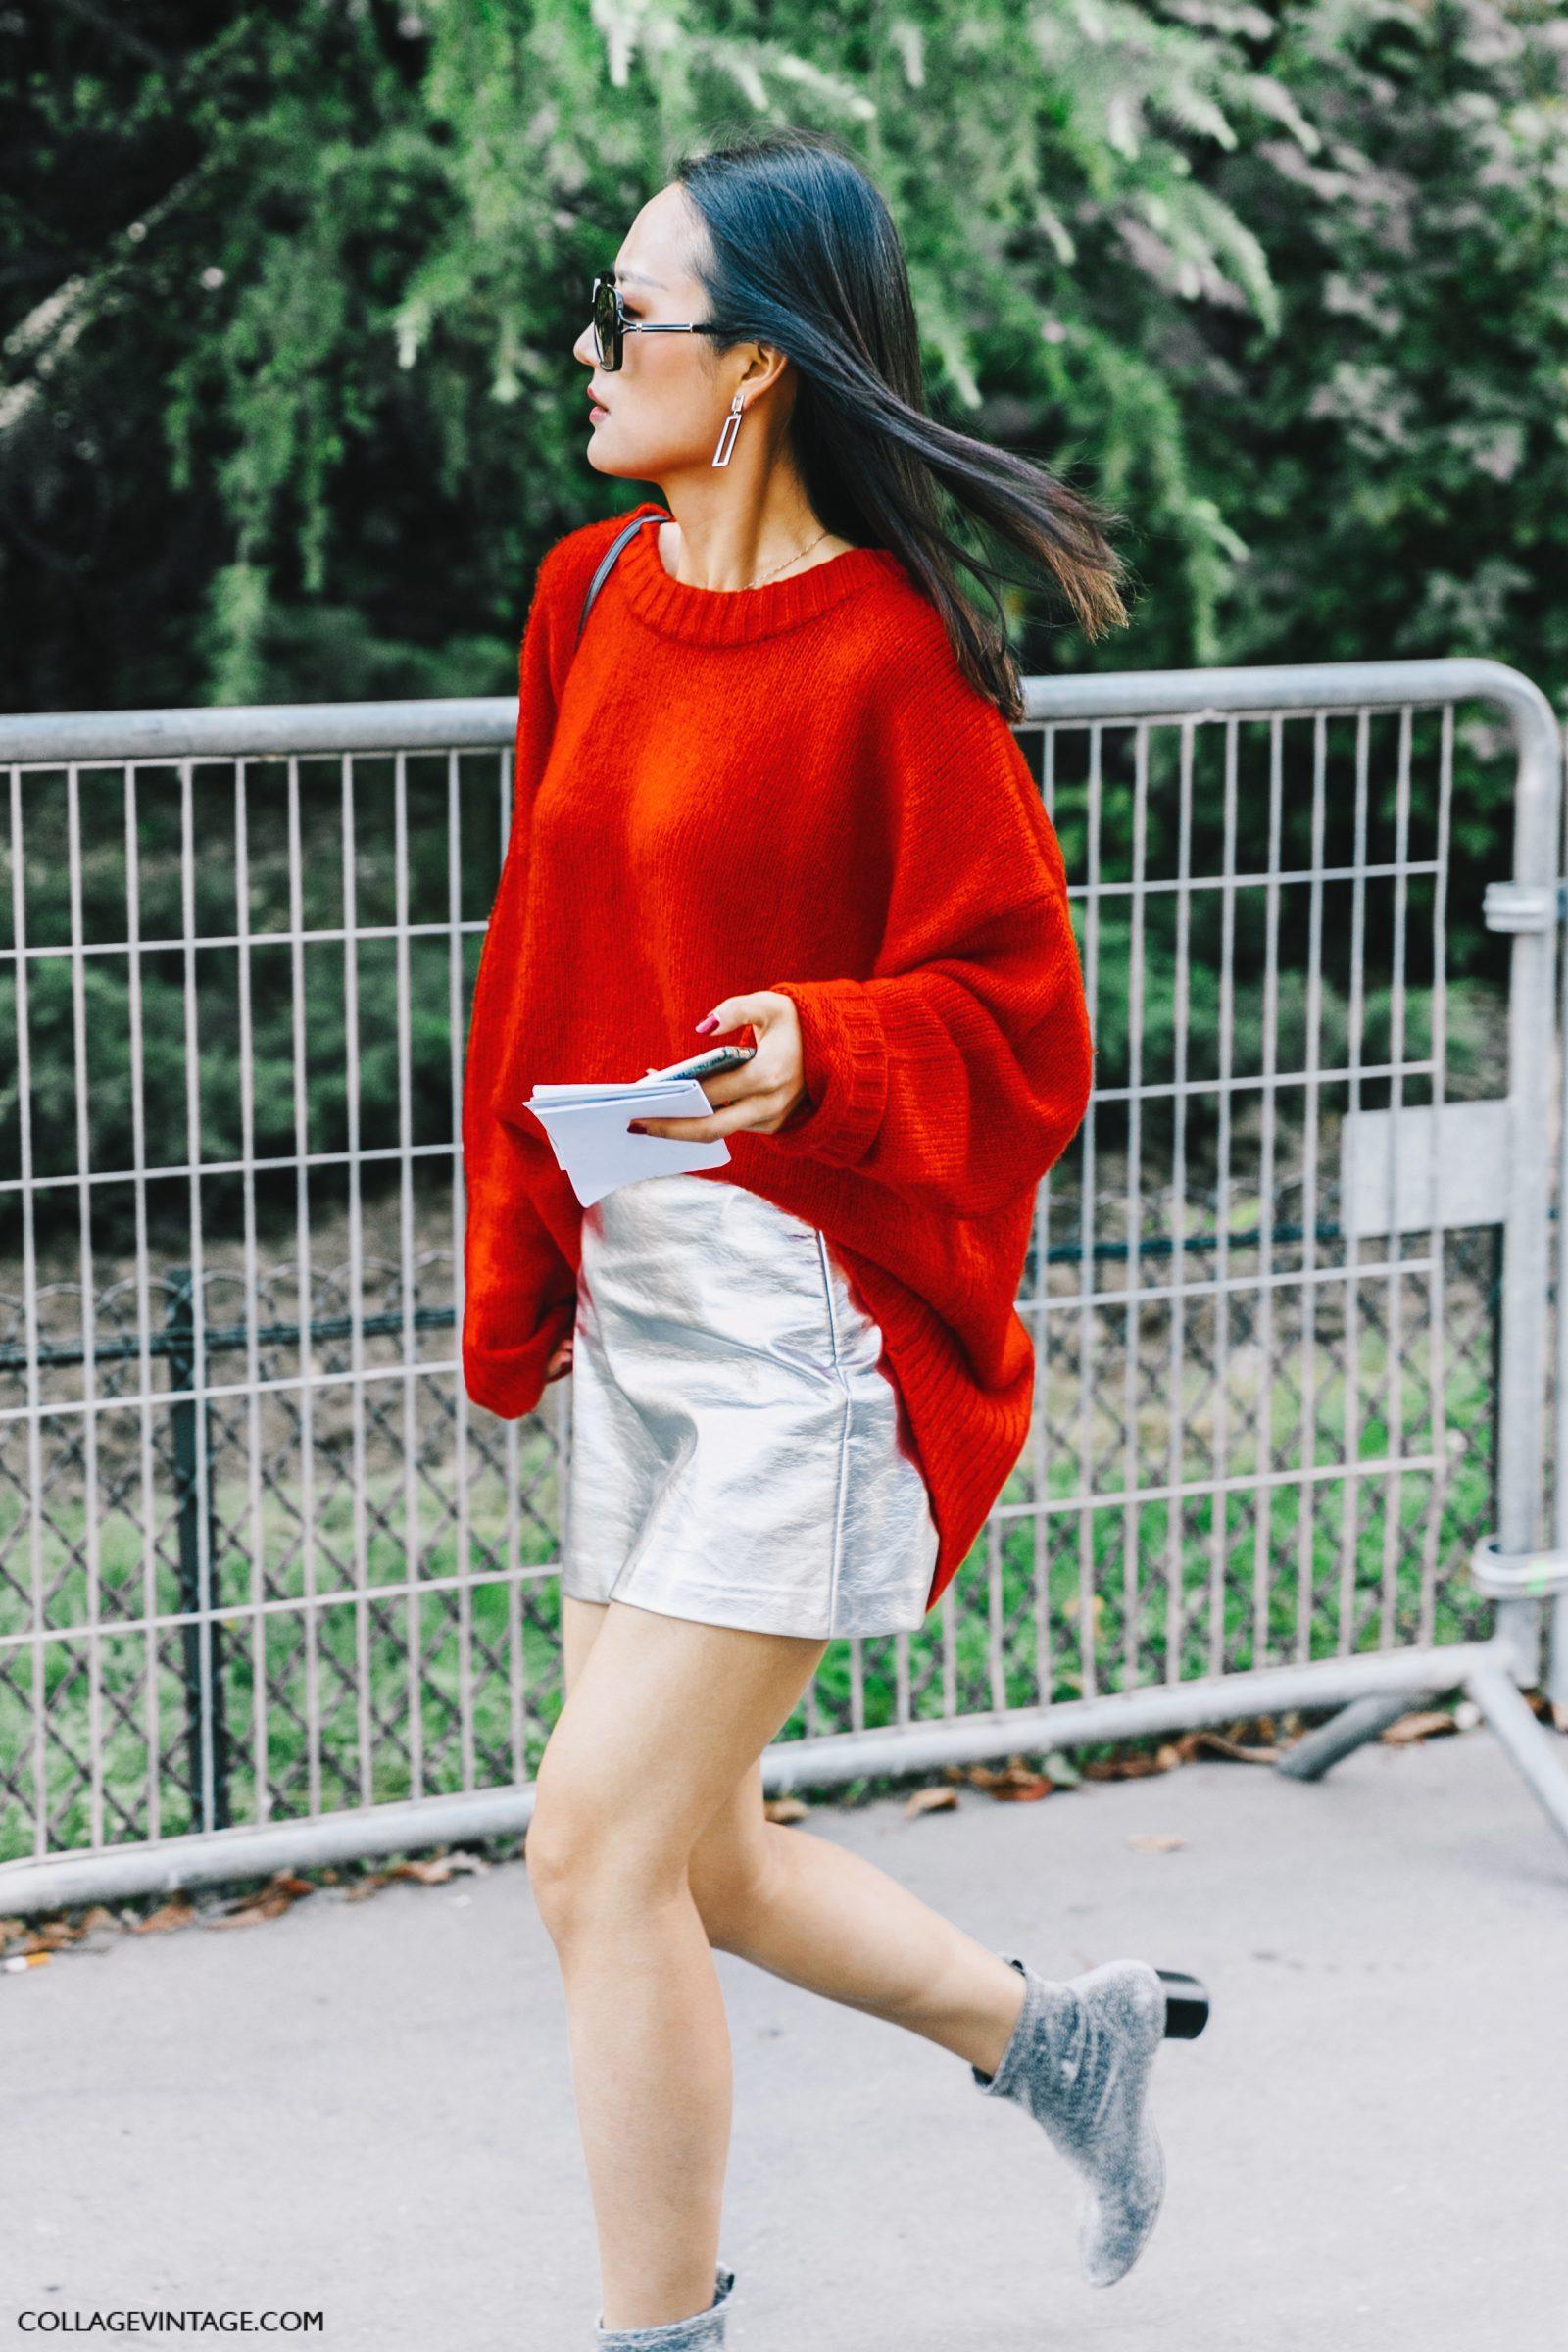 pfw-paris_fashion_week_ss17-street_style-outfits-collage_vintage-olympia_letan-hermes-stella_mccartney-sacai-120